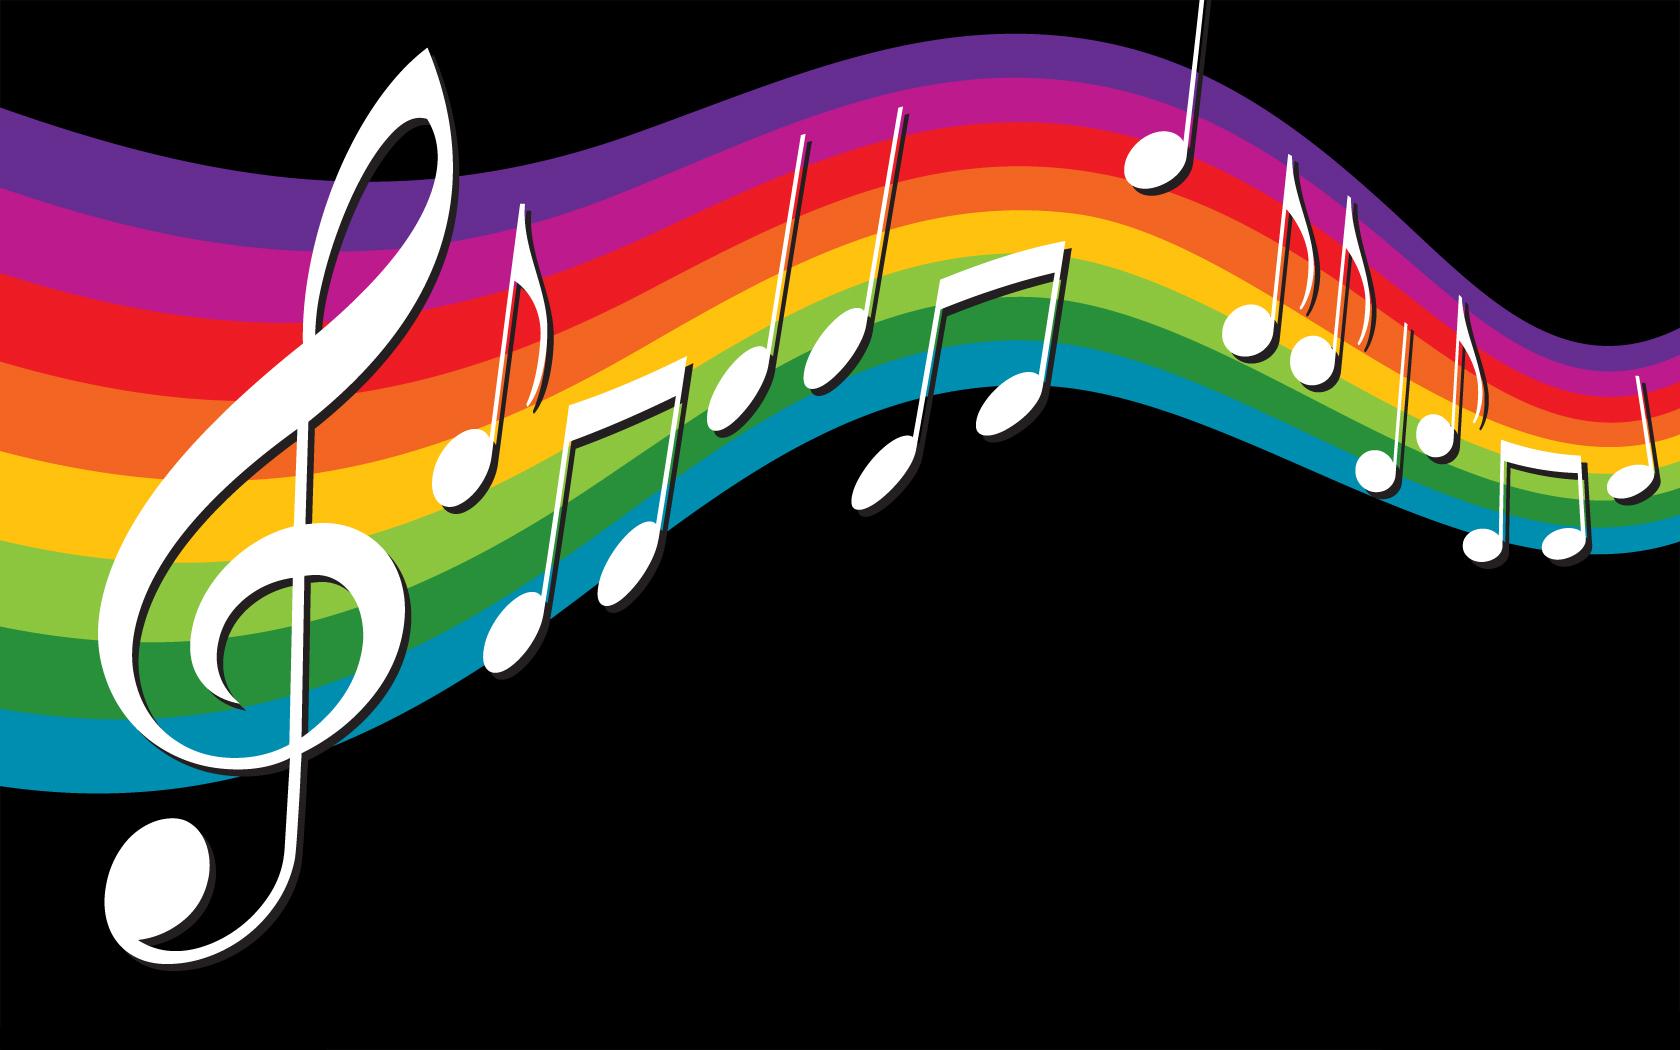 8589130490590_rainbow_music_notes_wallpaper_hd.jpg